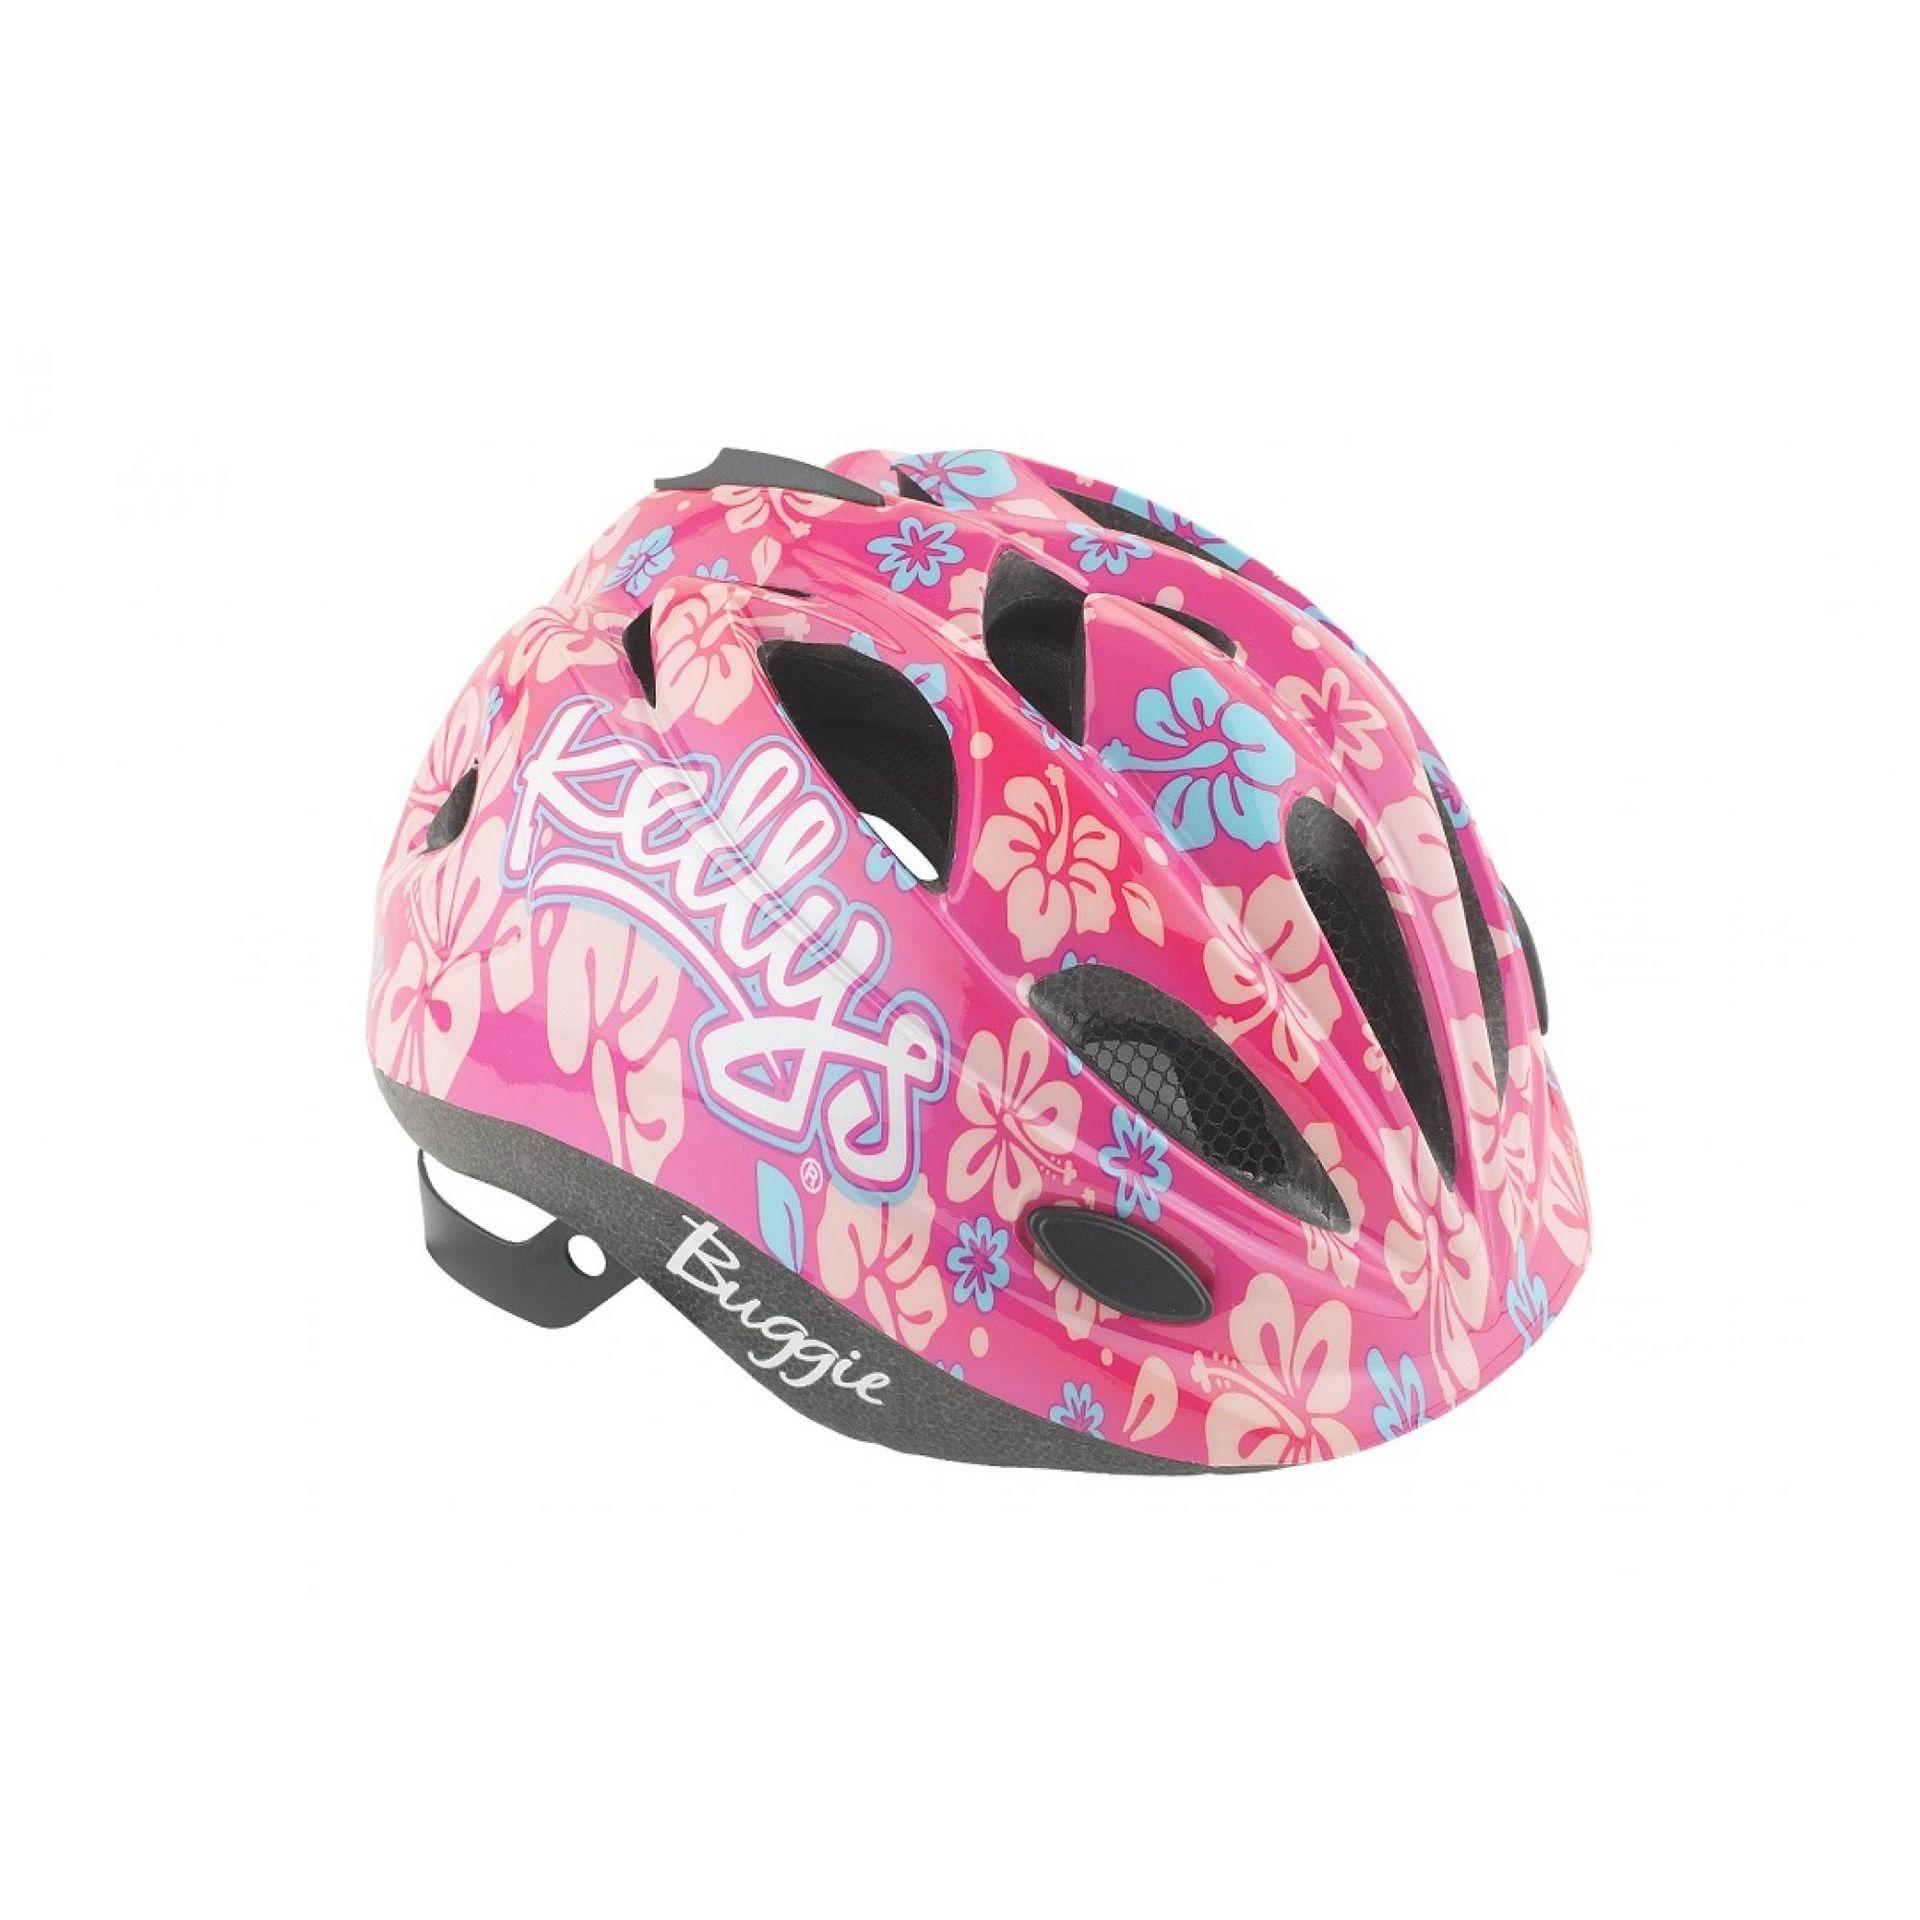 Kask rowerowy Kellys Buggie różowy